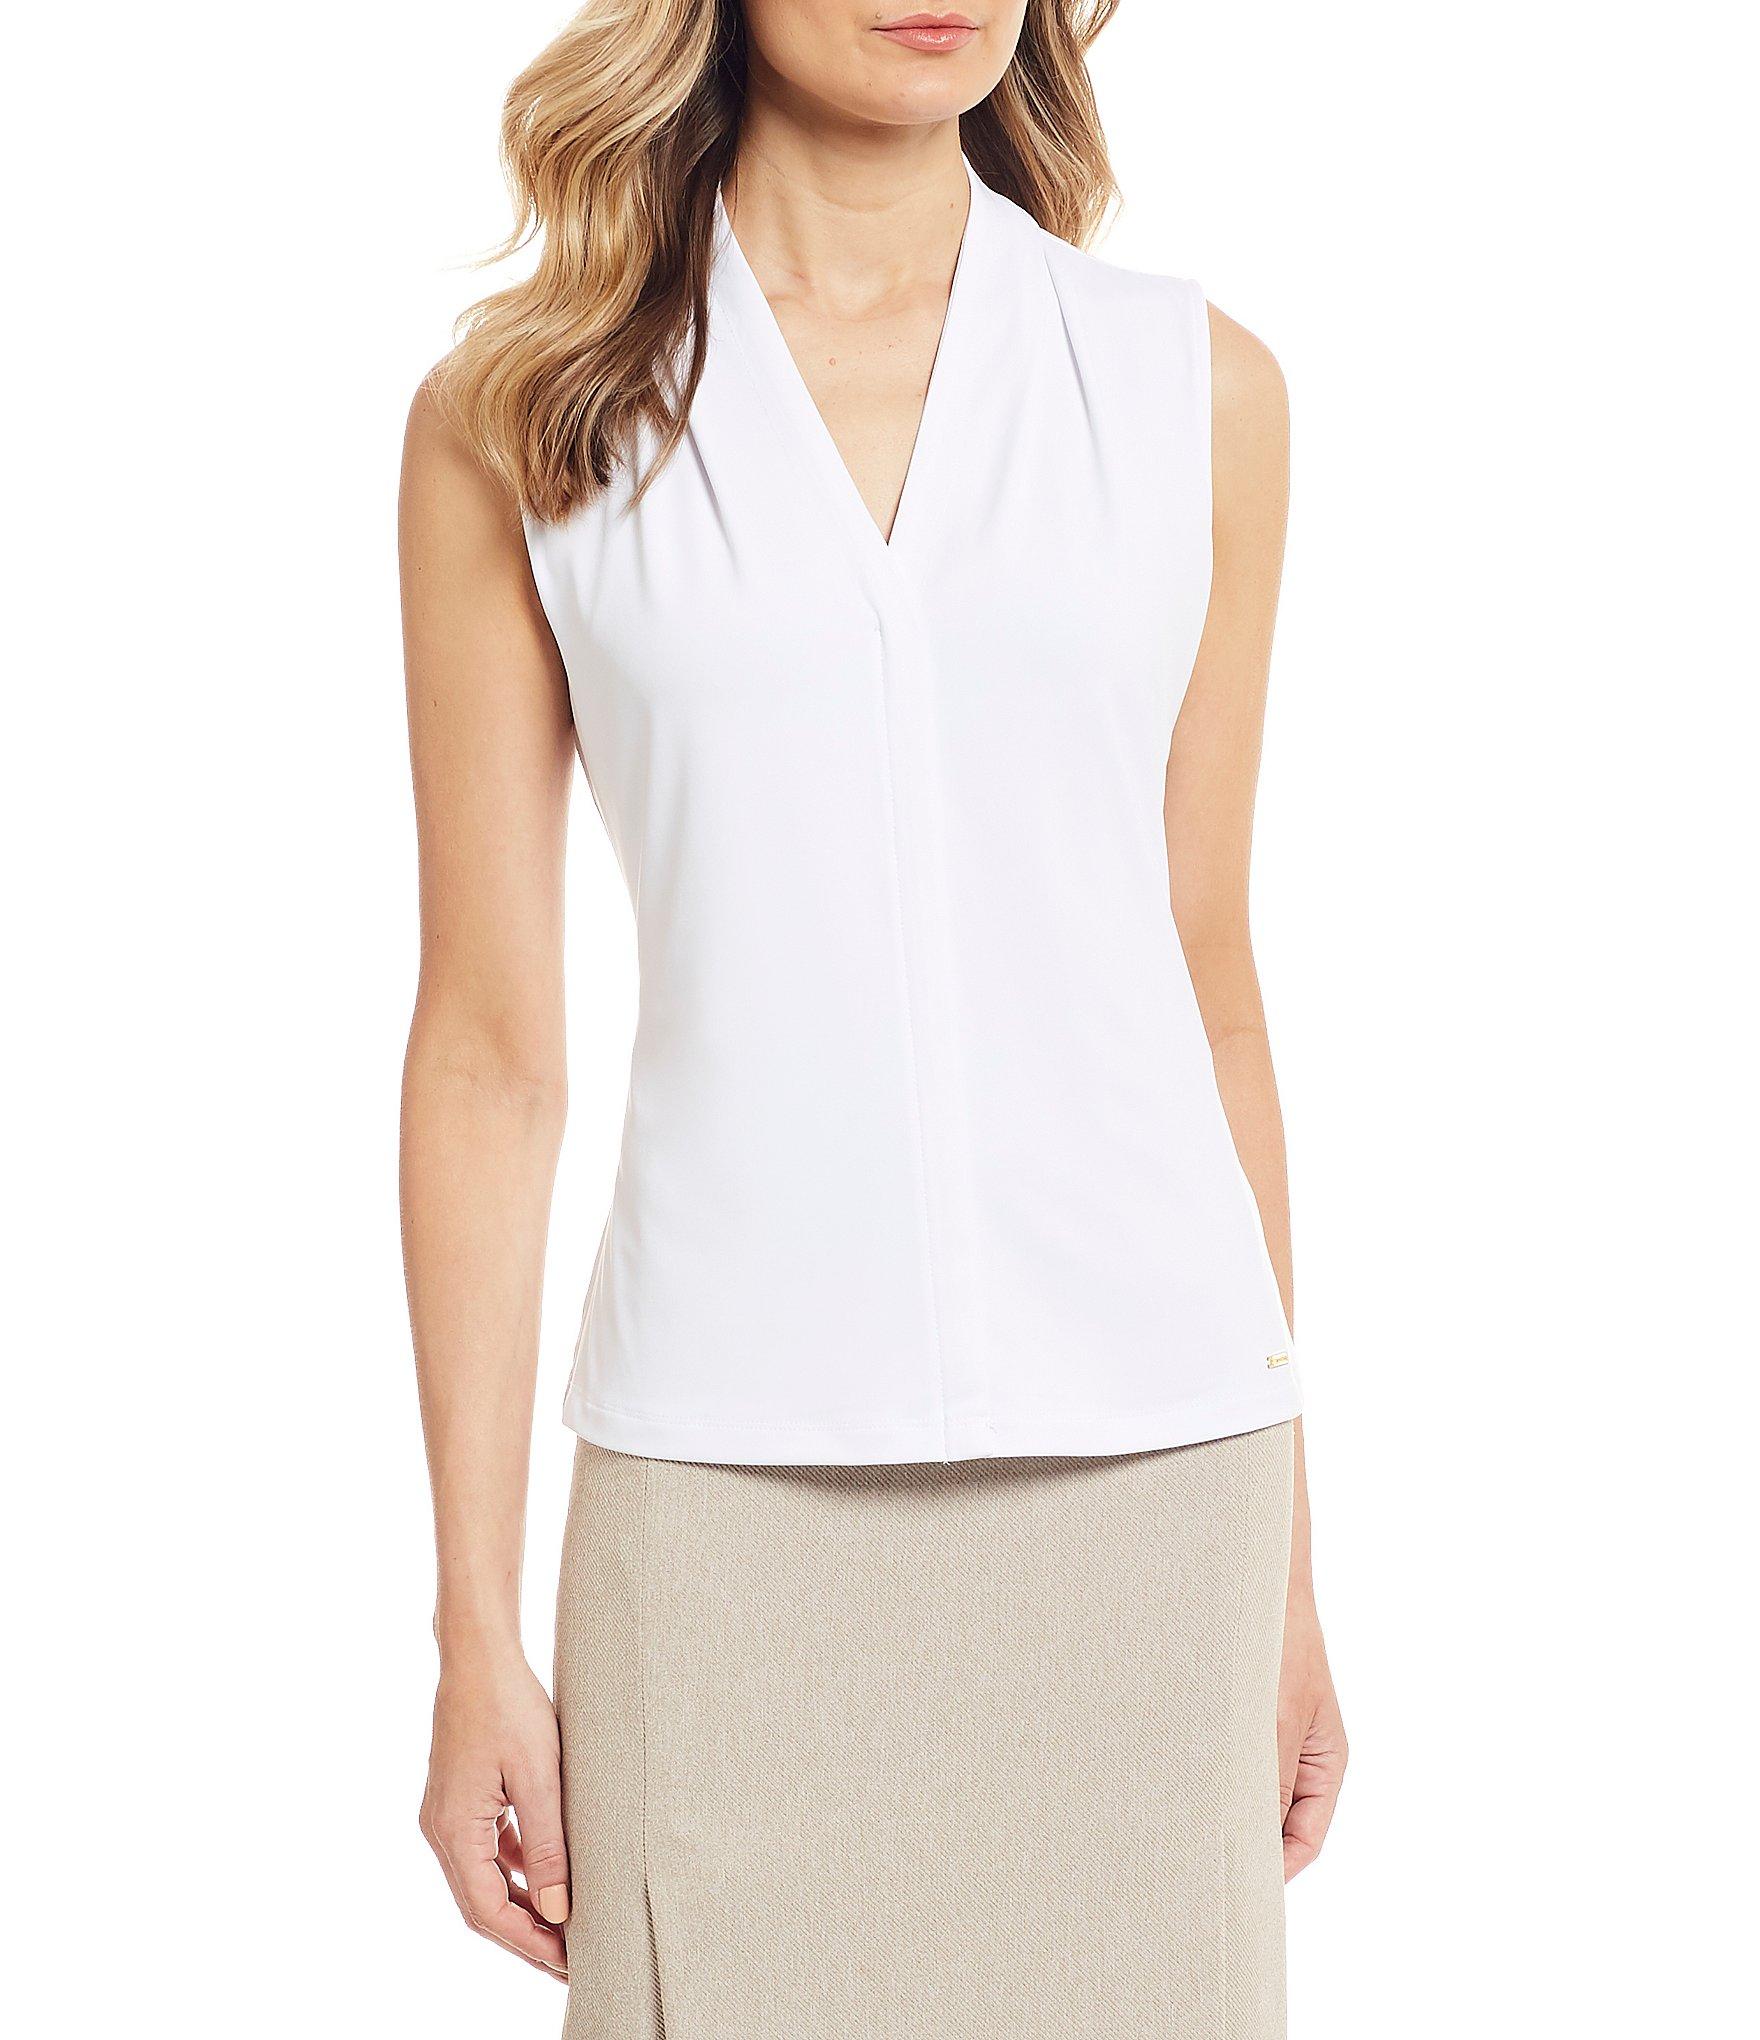 53ed3c5946b V-Neck Women's Casual & Dressy Tops & Blouses | Dillard's